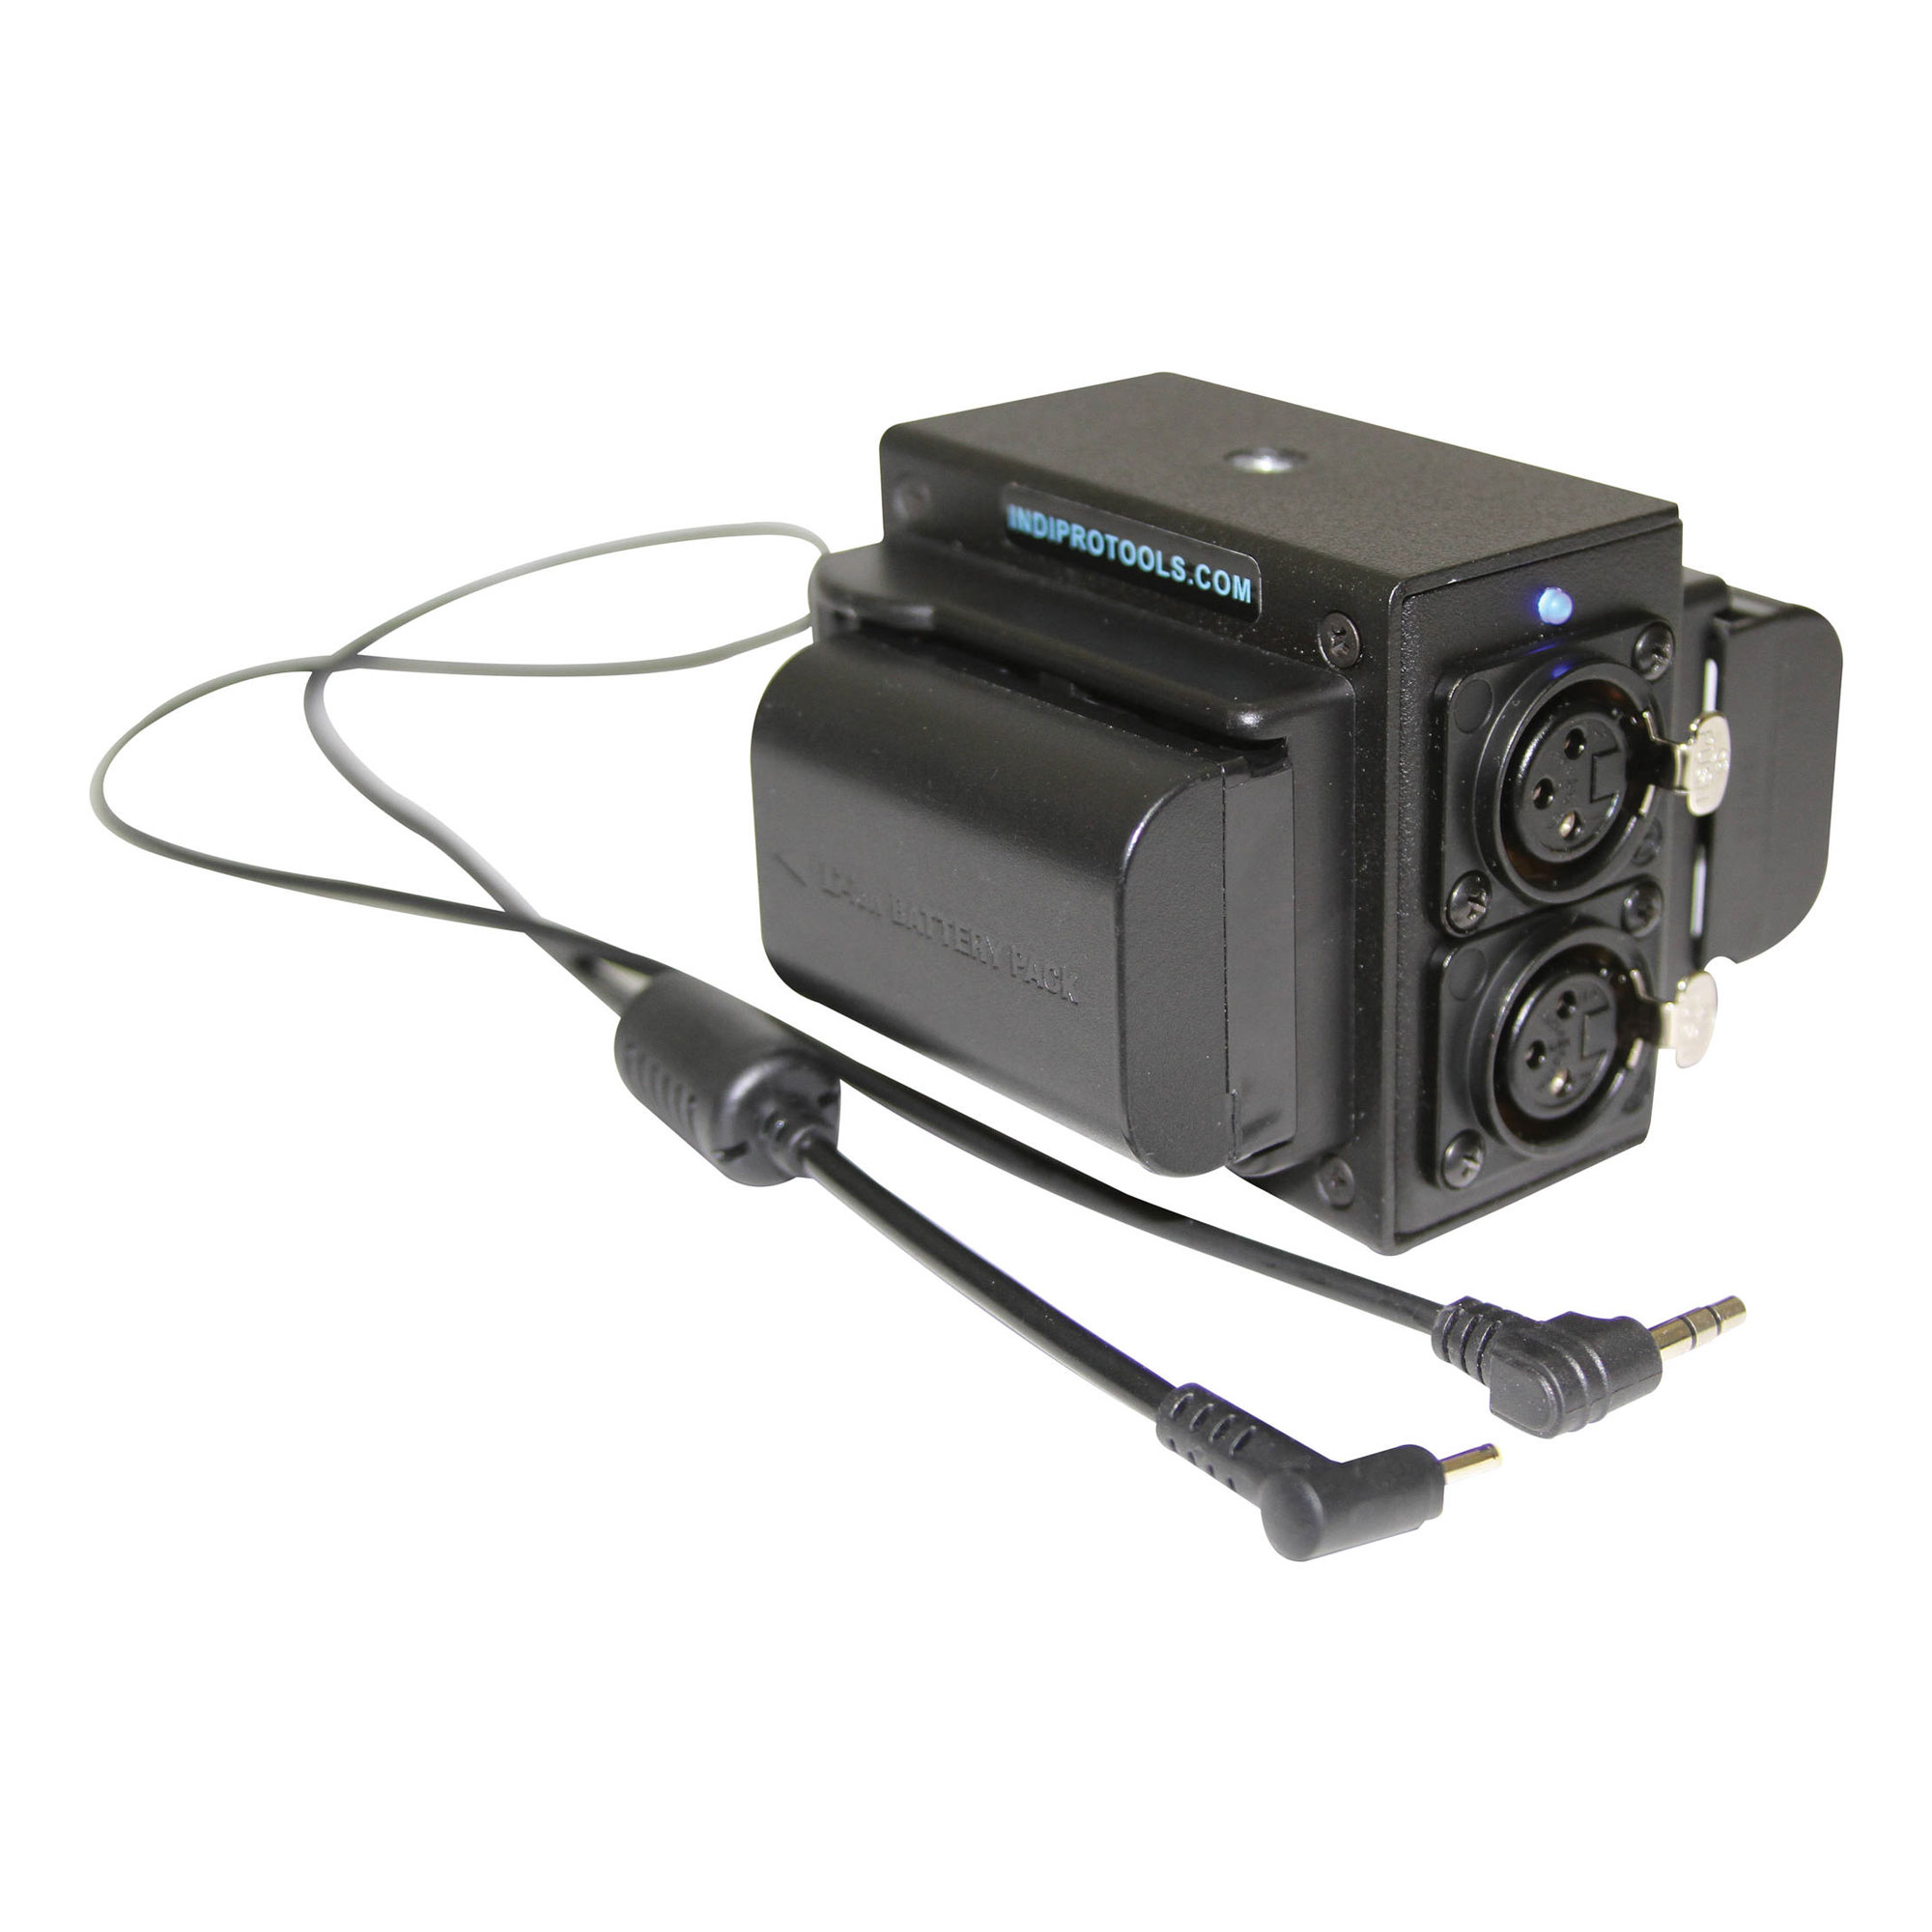 Pro Series Power Grid  XLR Audio Box for Blackmagic Pocket Camera